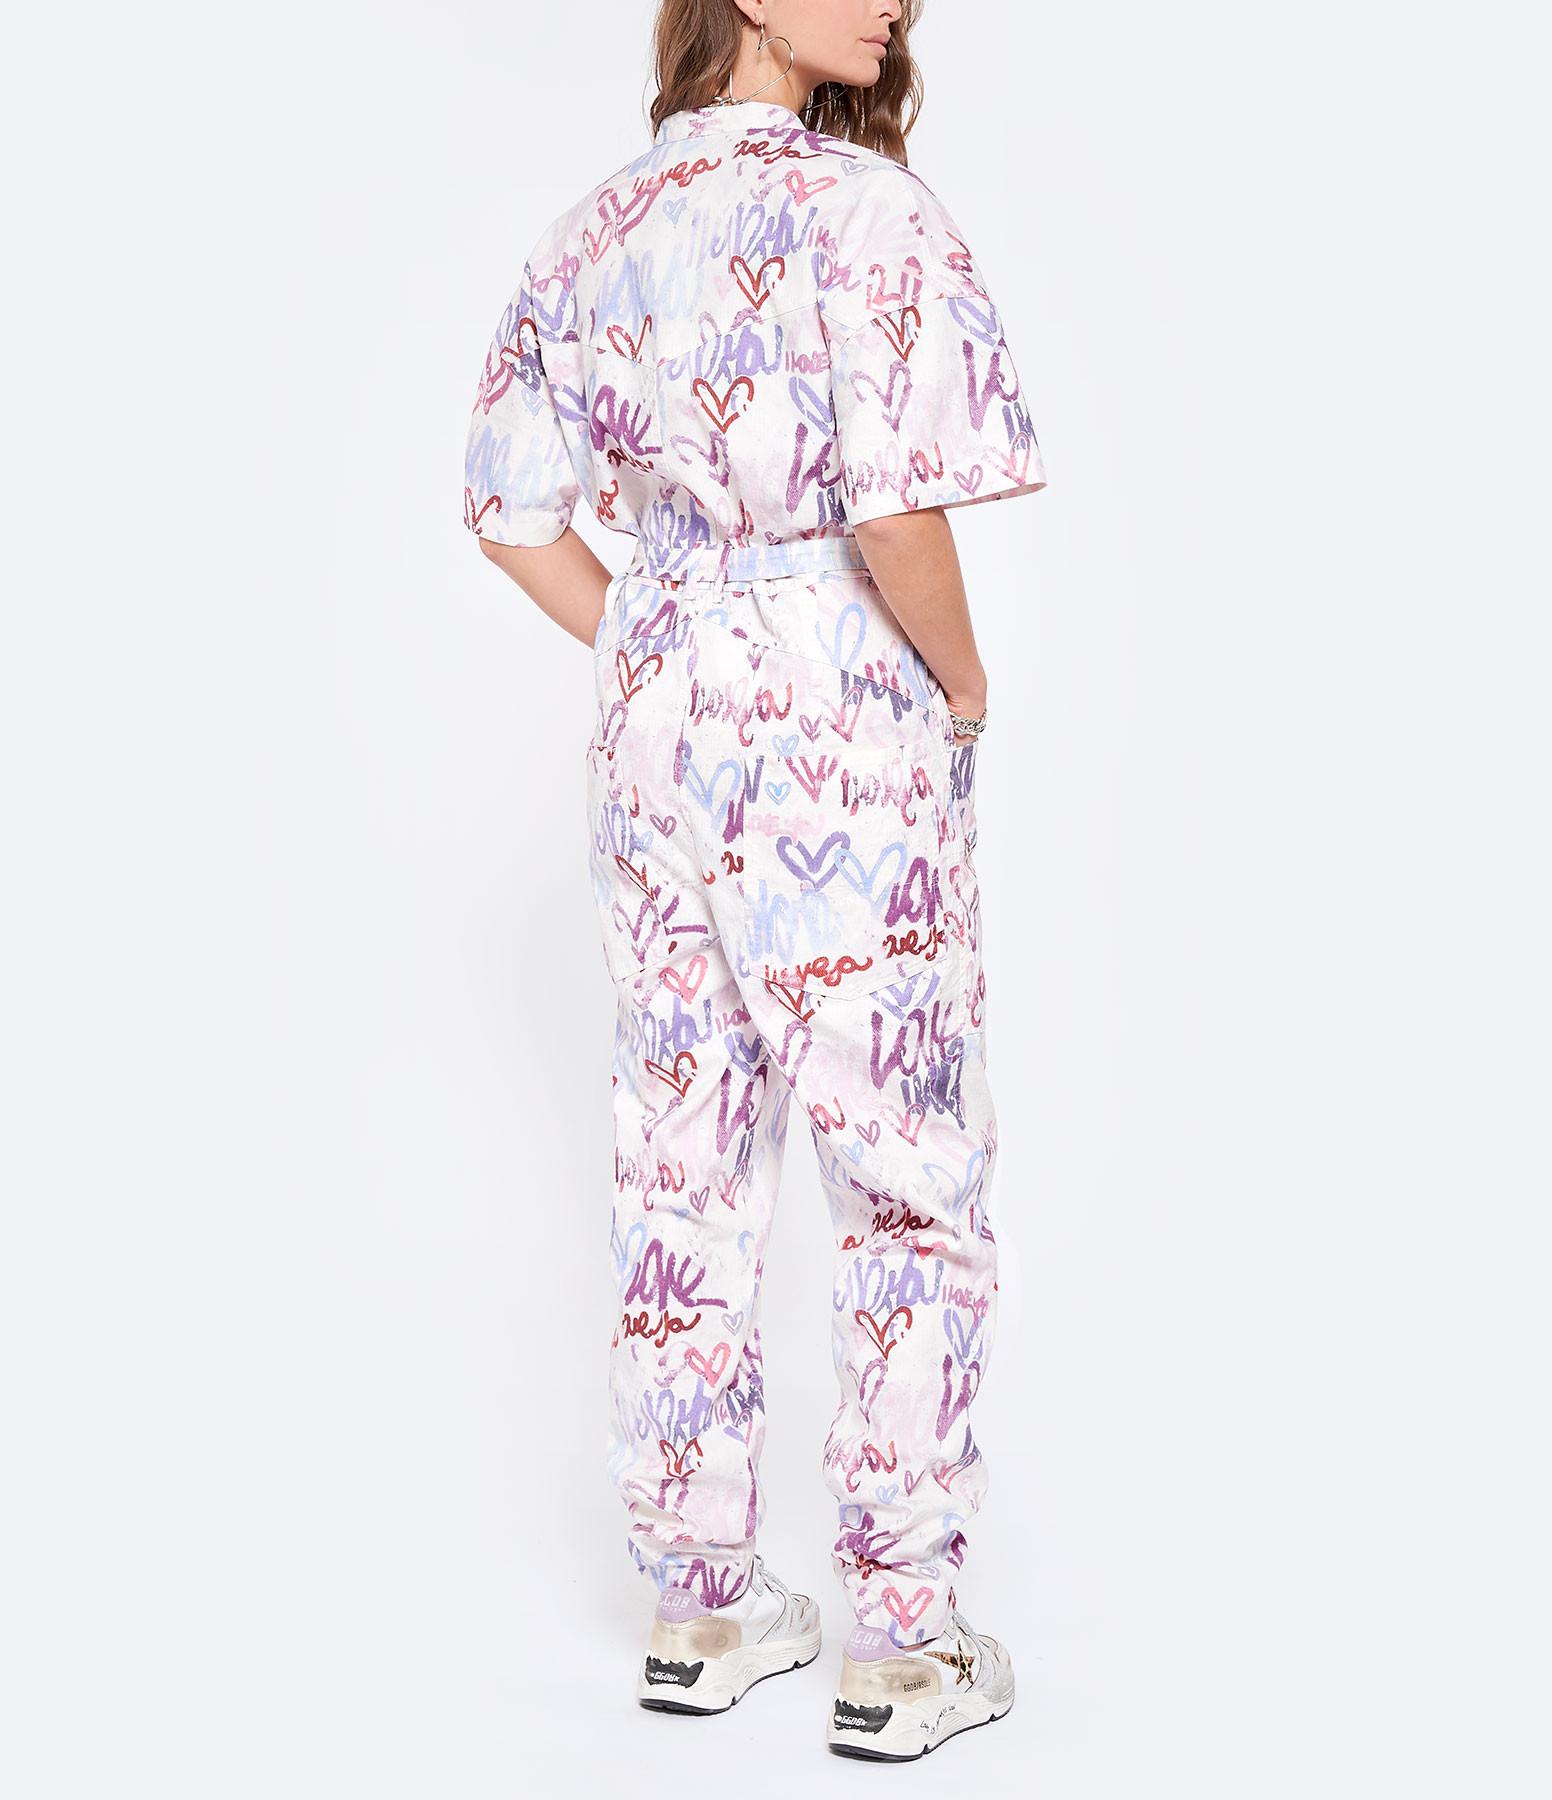 ISABEL MARANT - Combinaison Etundra Lin Coton Multicolore